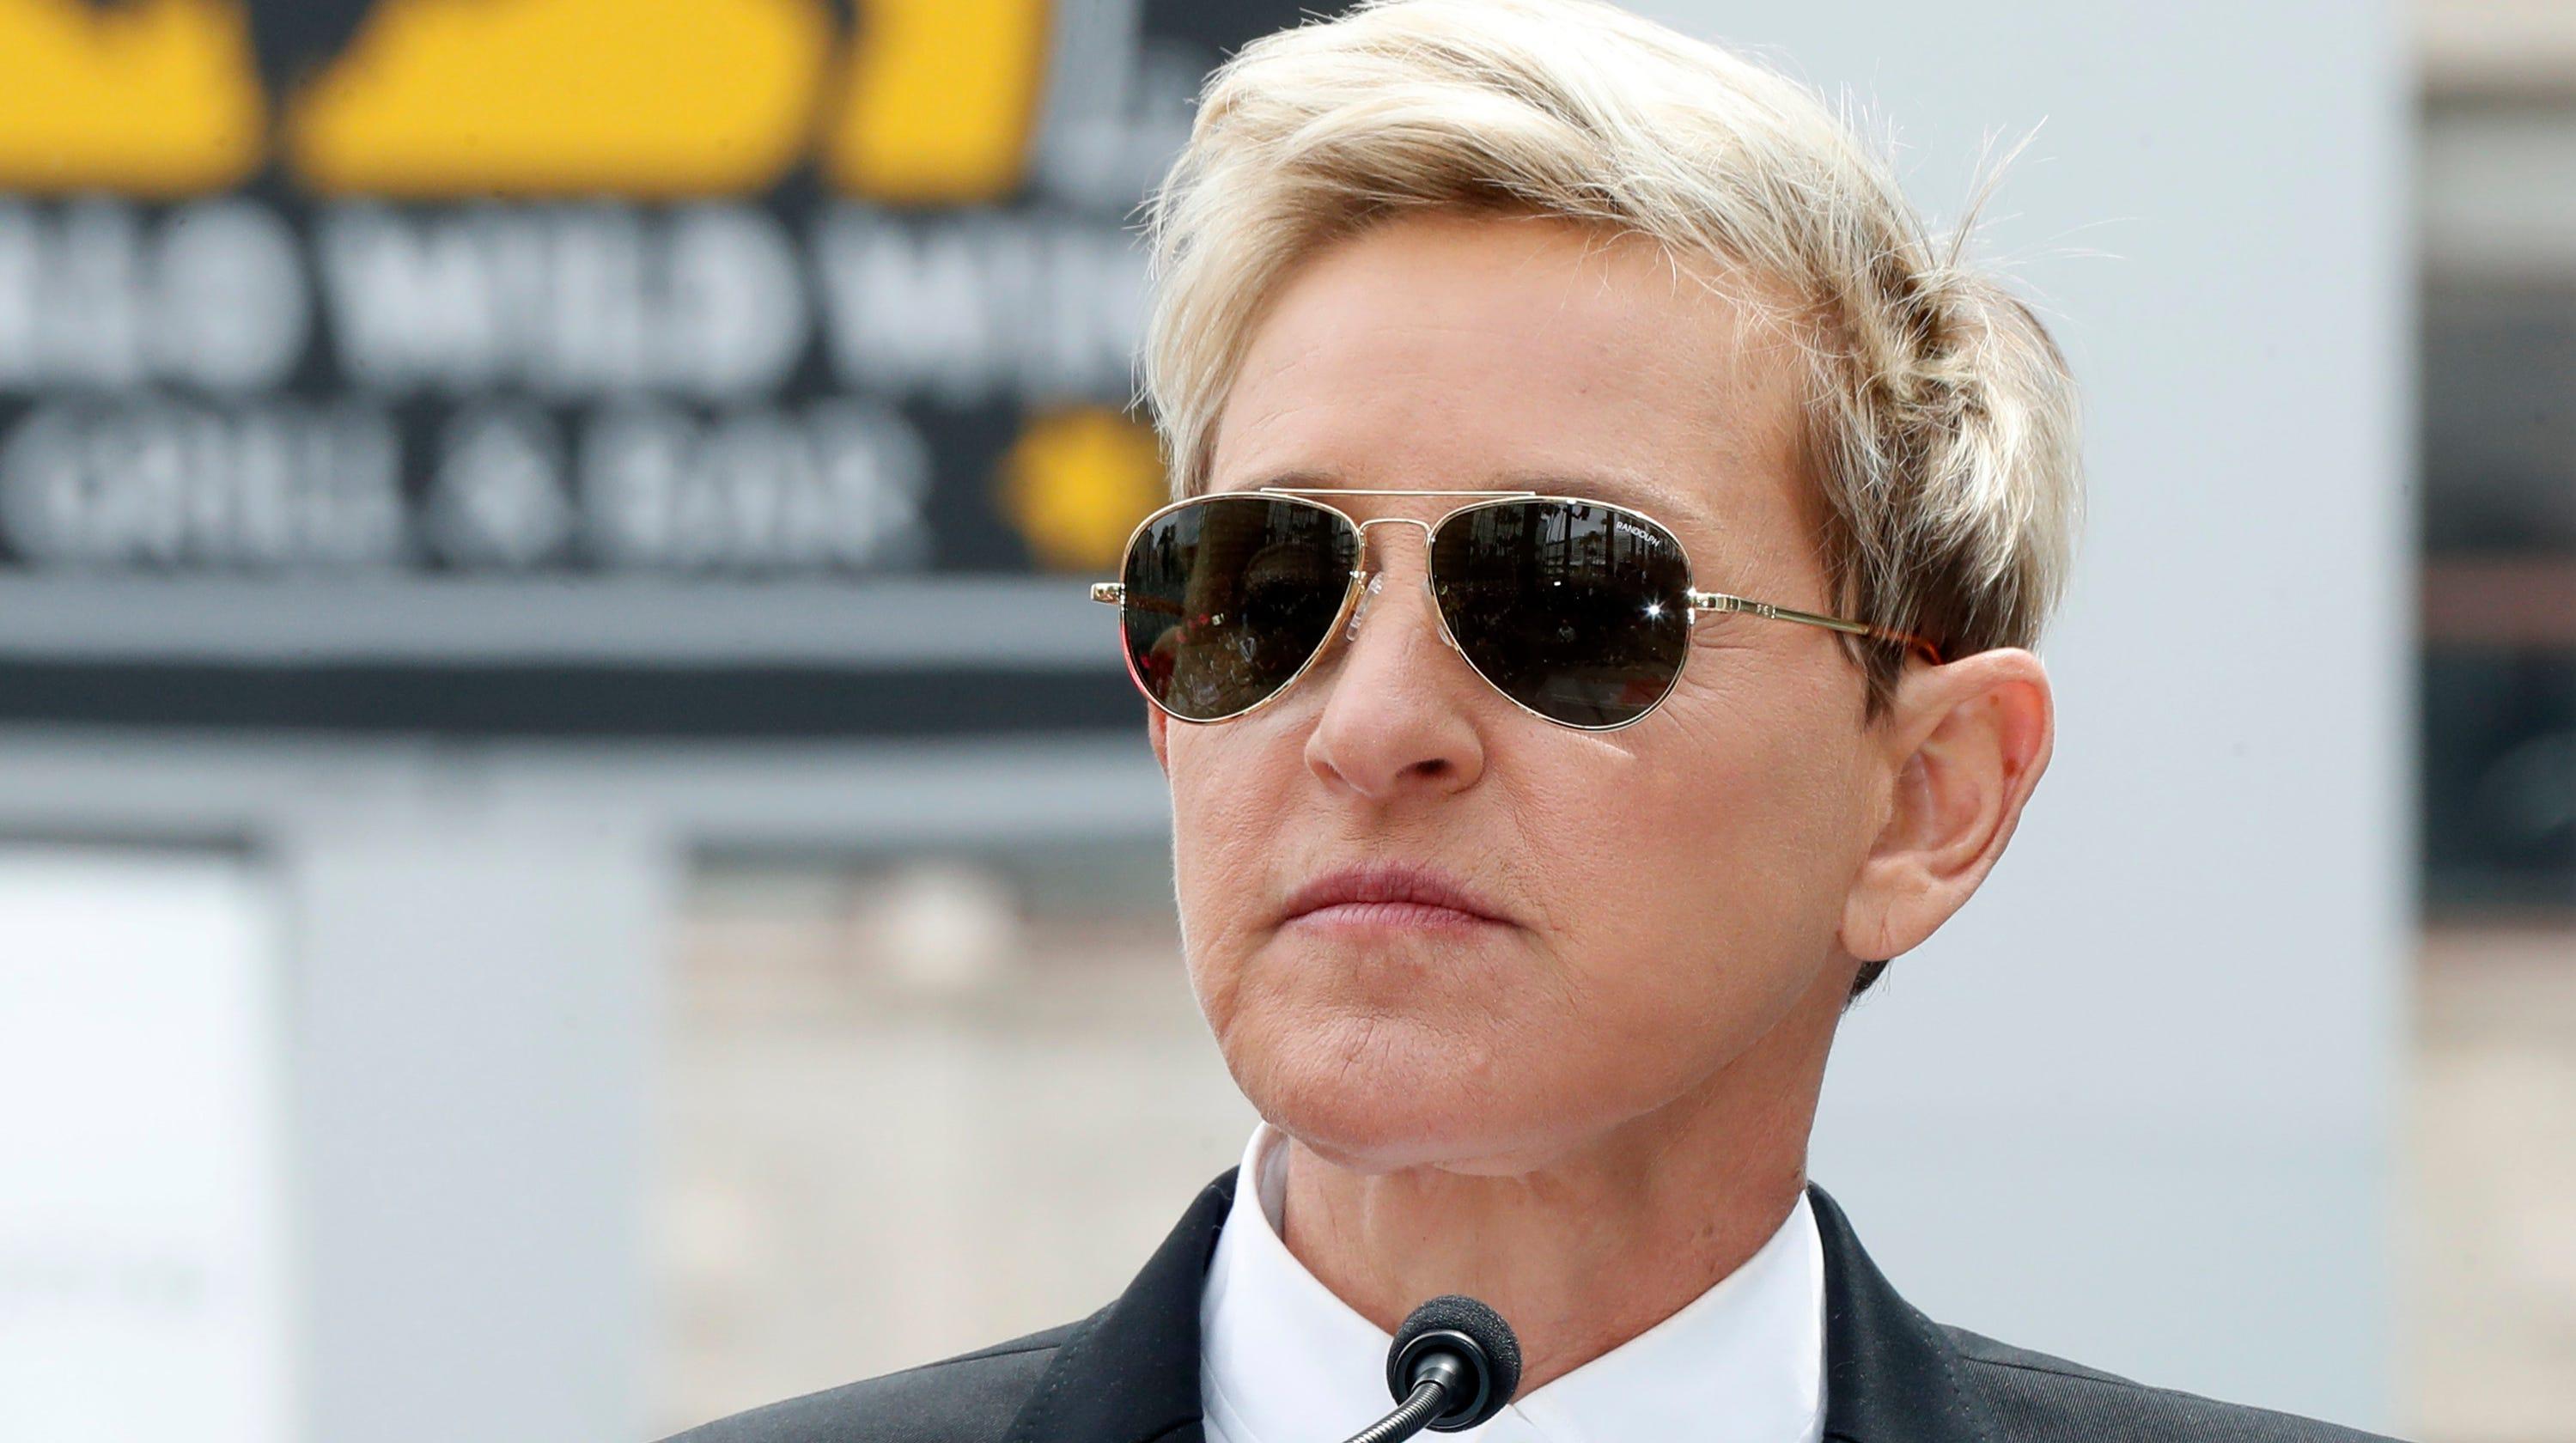 Ellen DeGeneres: Stepfather groped me, tried to break into